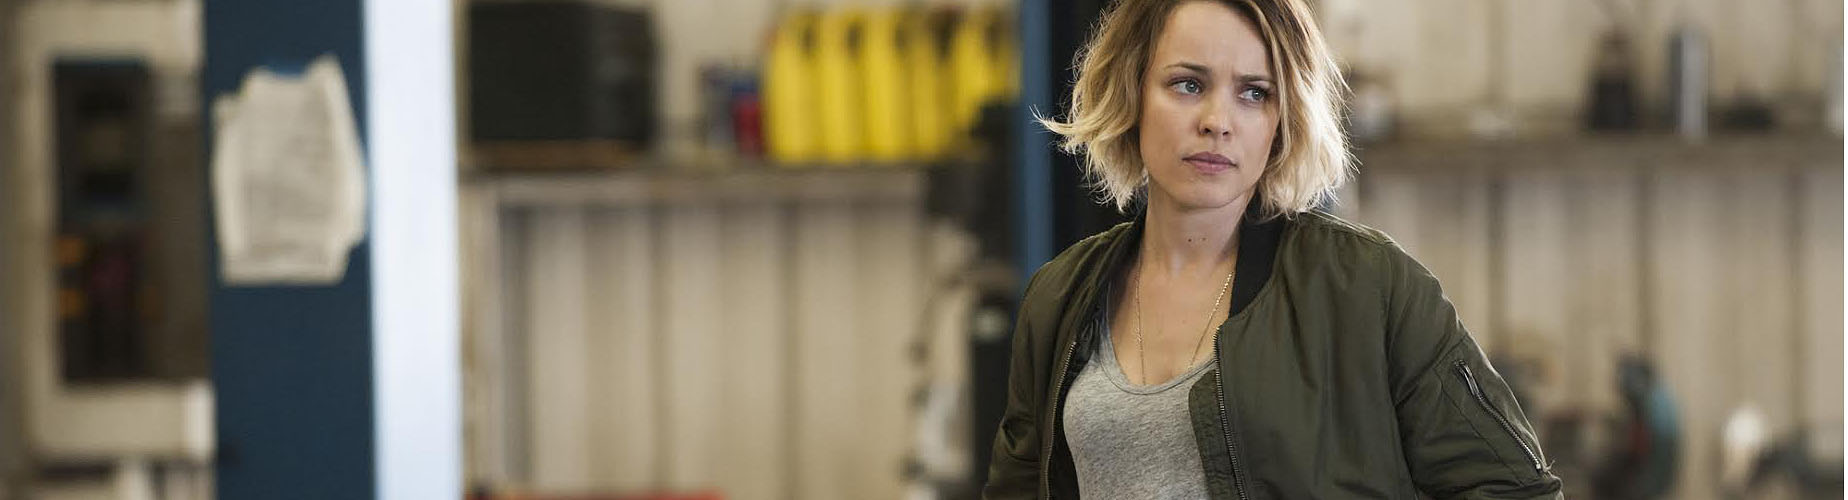 "Rachel Talks ""True Detective"" Episode 4 With Variety"